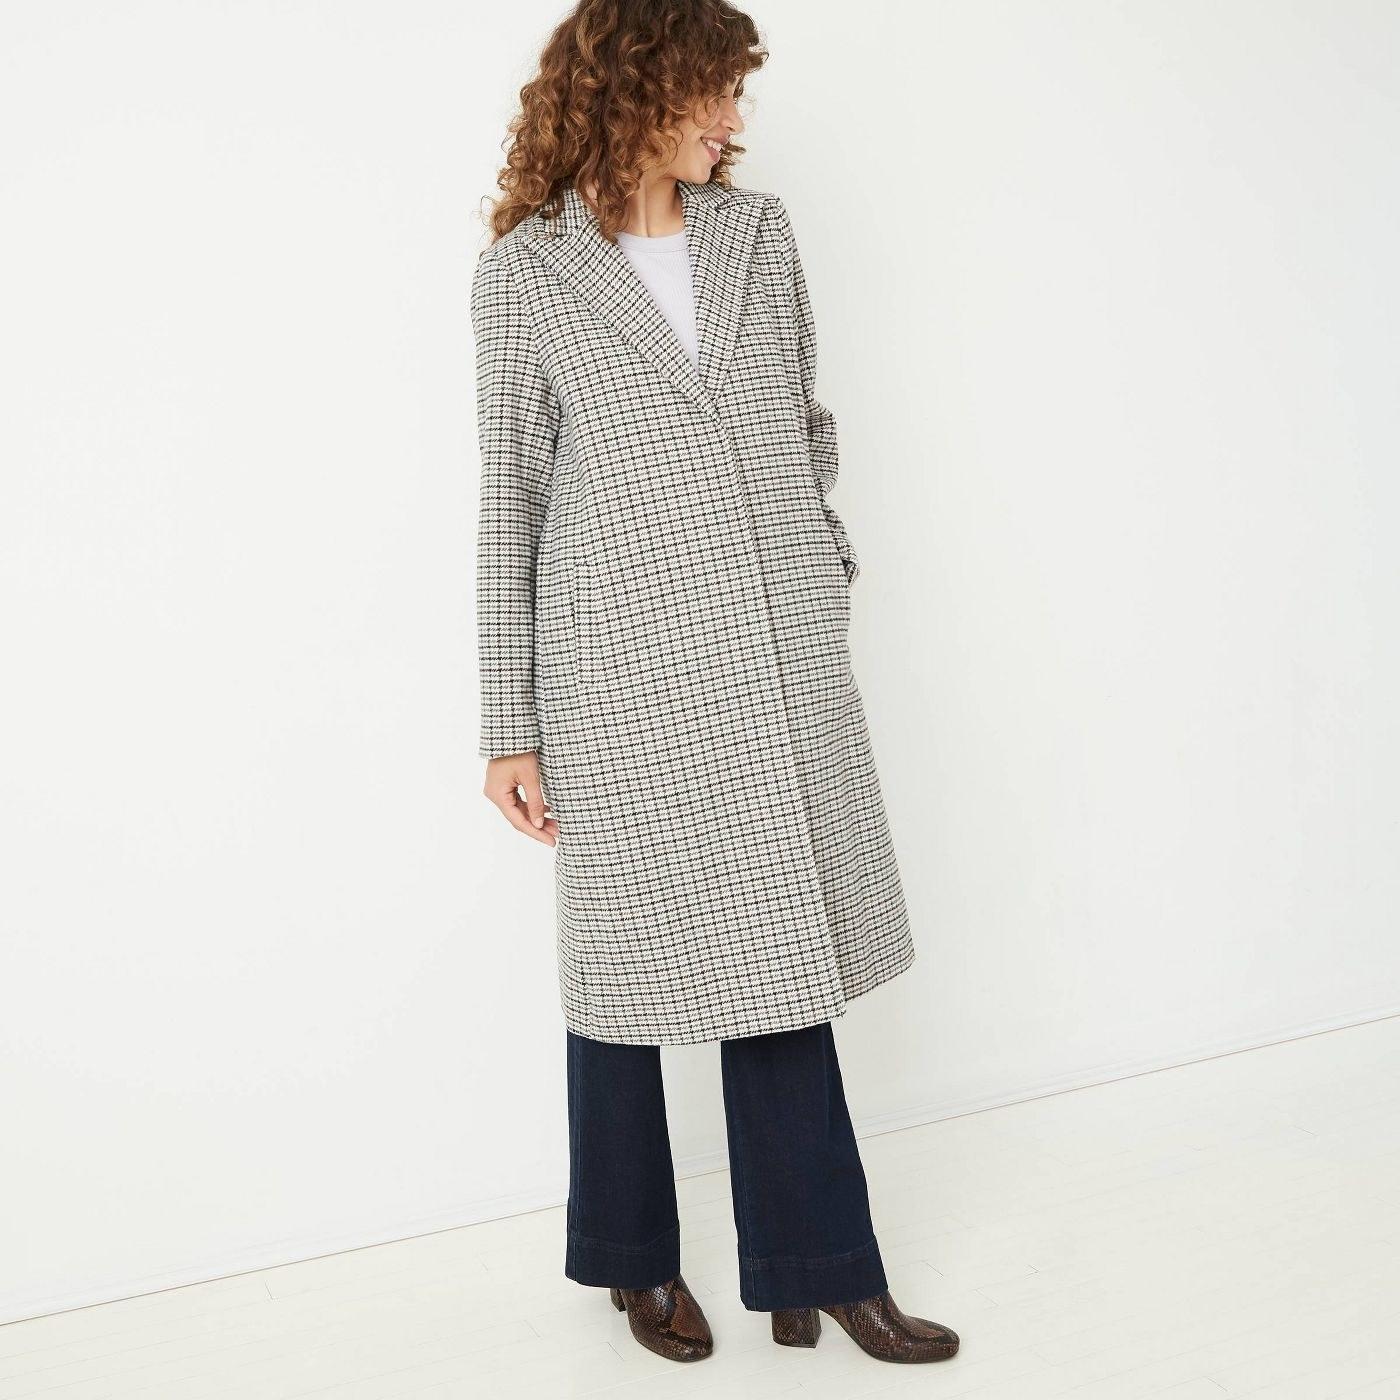 Model in overcoat